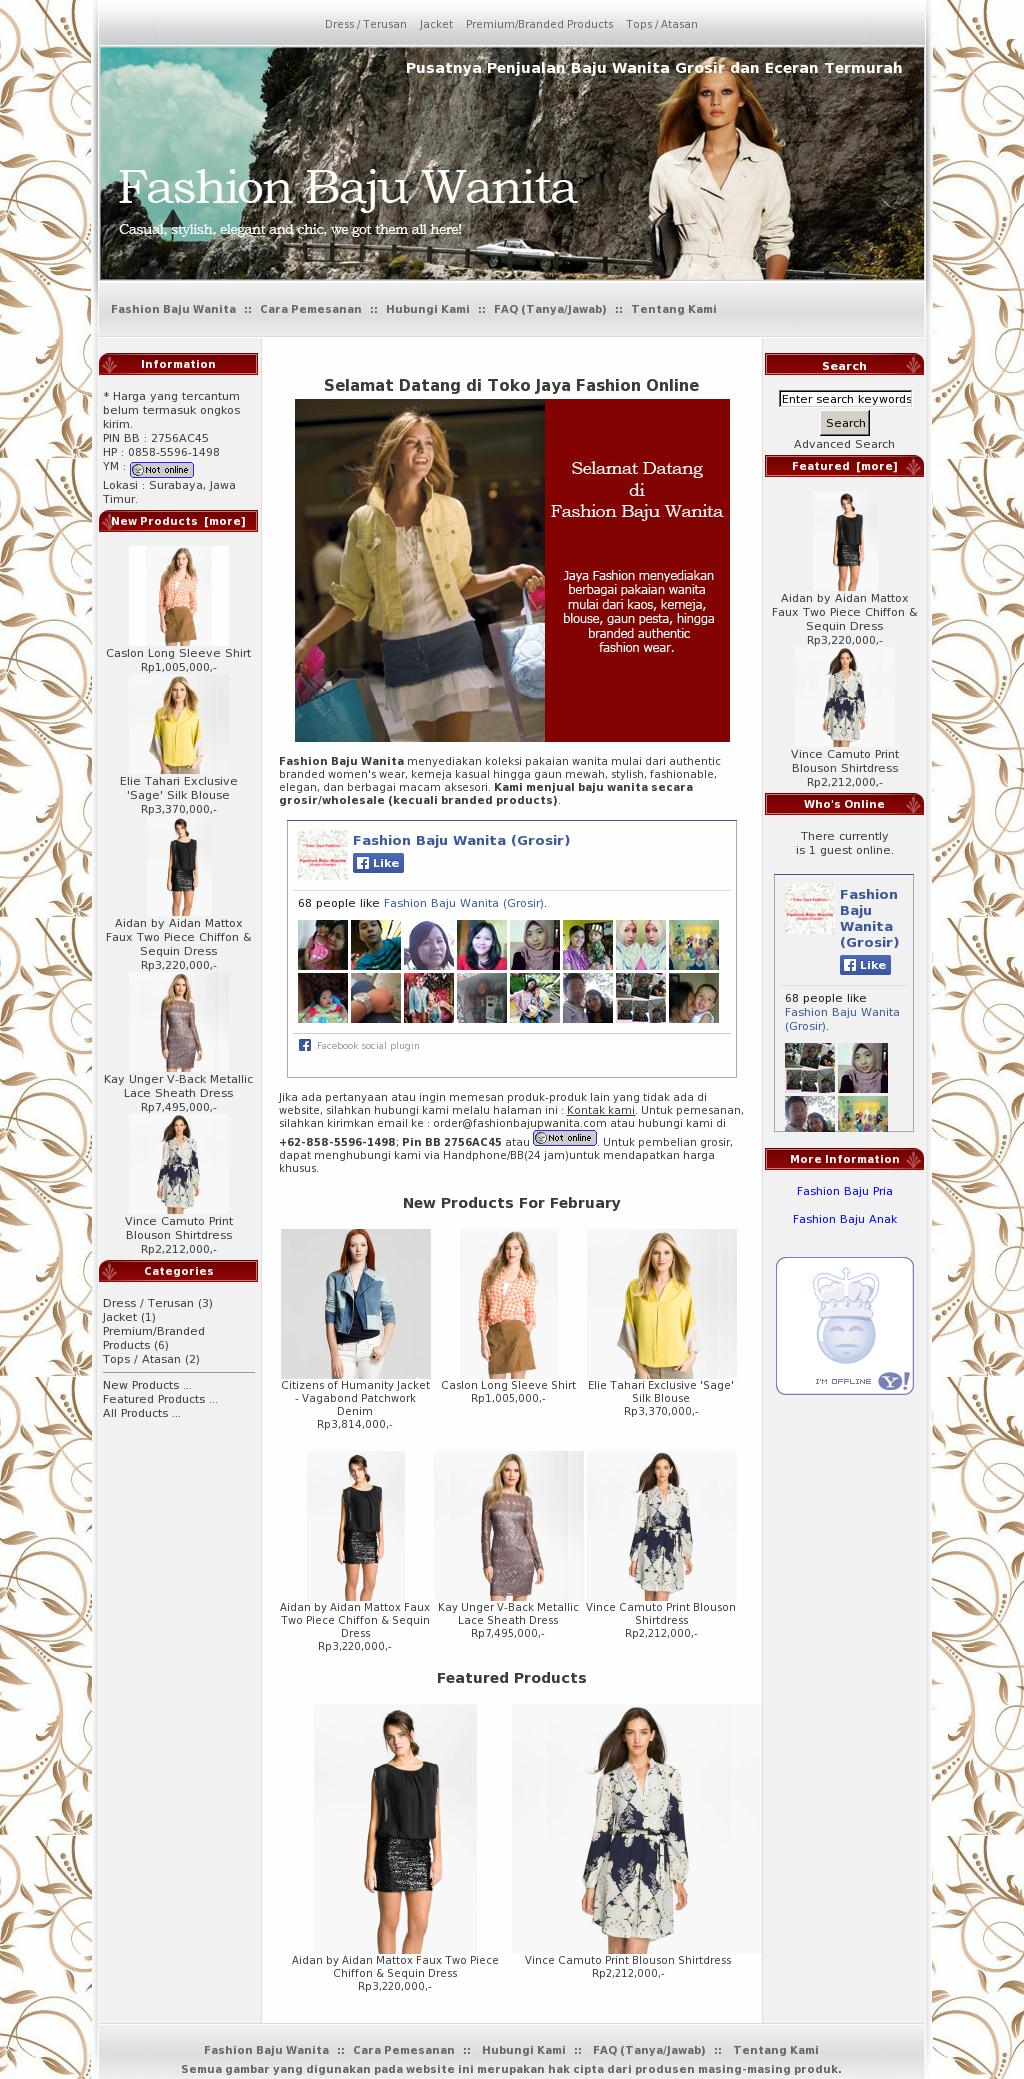 Fashion Baju Wanita Grosir Competitors Revenue And Employees Atasan Hp Owler Company Profile